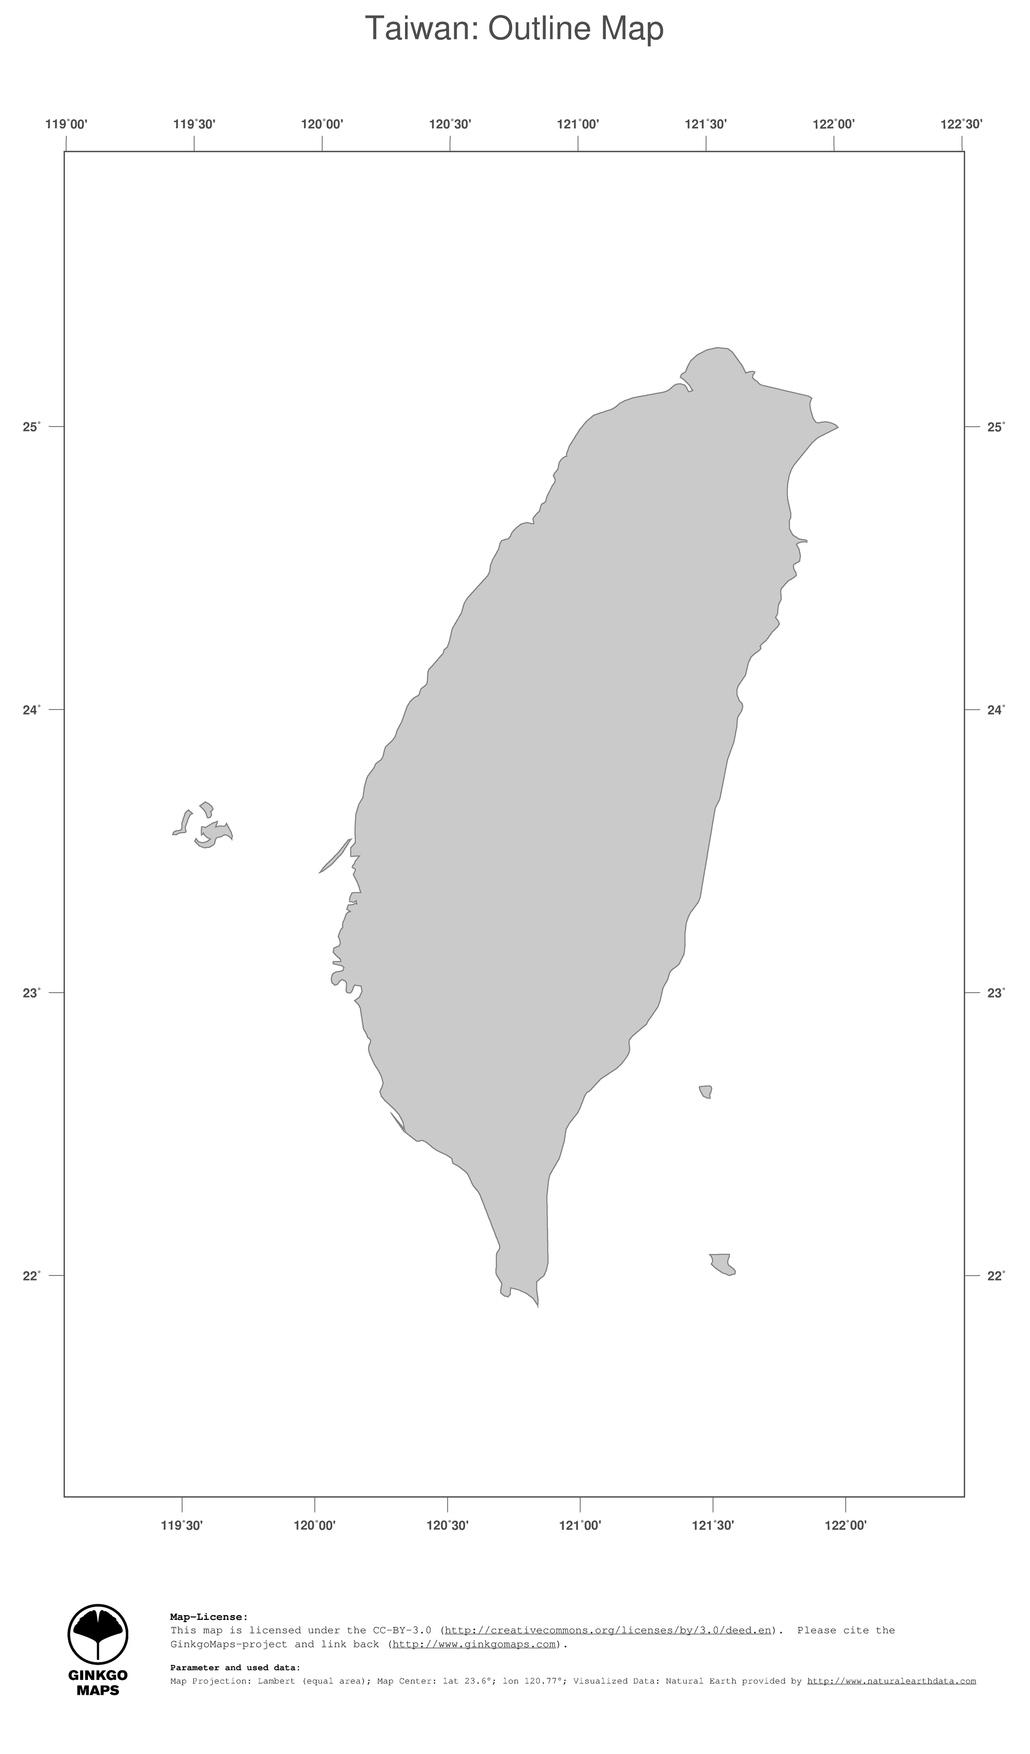 Taiwanese people